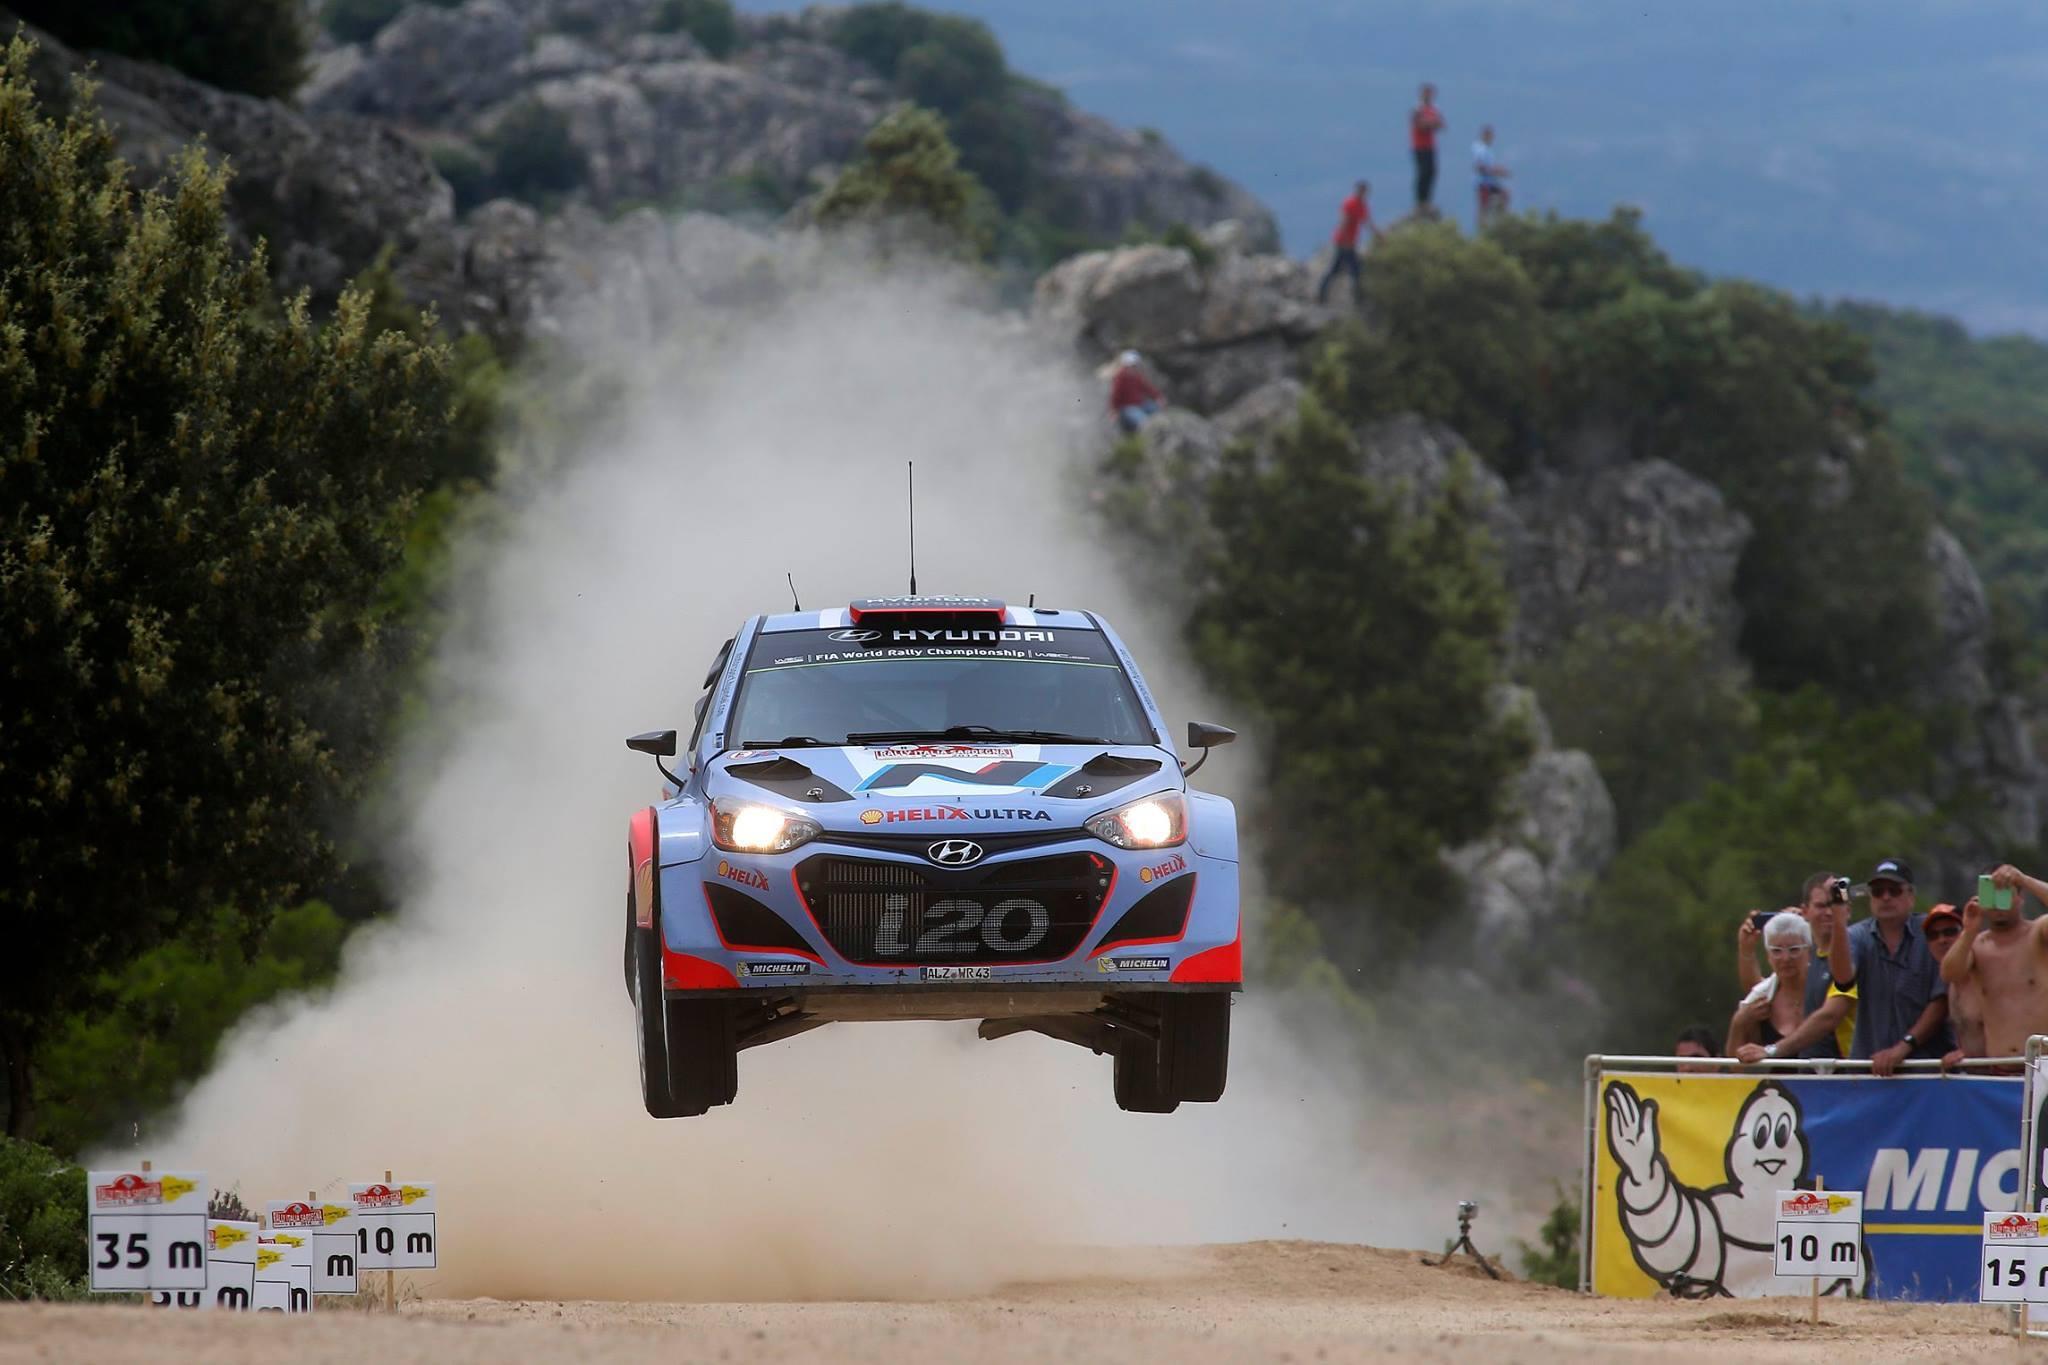 Rallye Fond D Ecran Hd Arriere Plan 2048x1365 Id 527853 Wallpaper Abyss